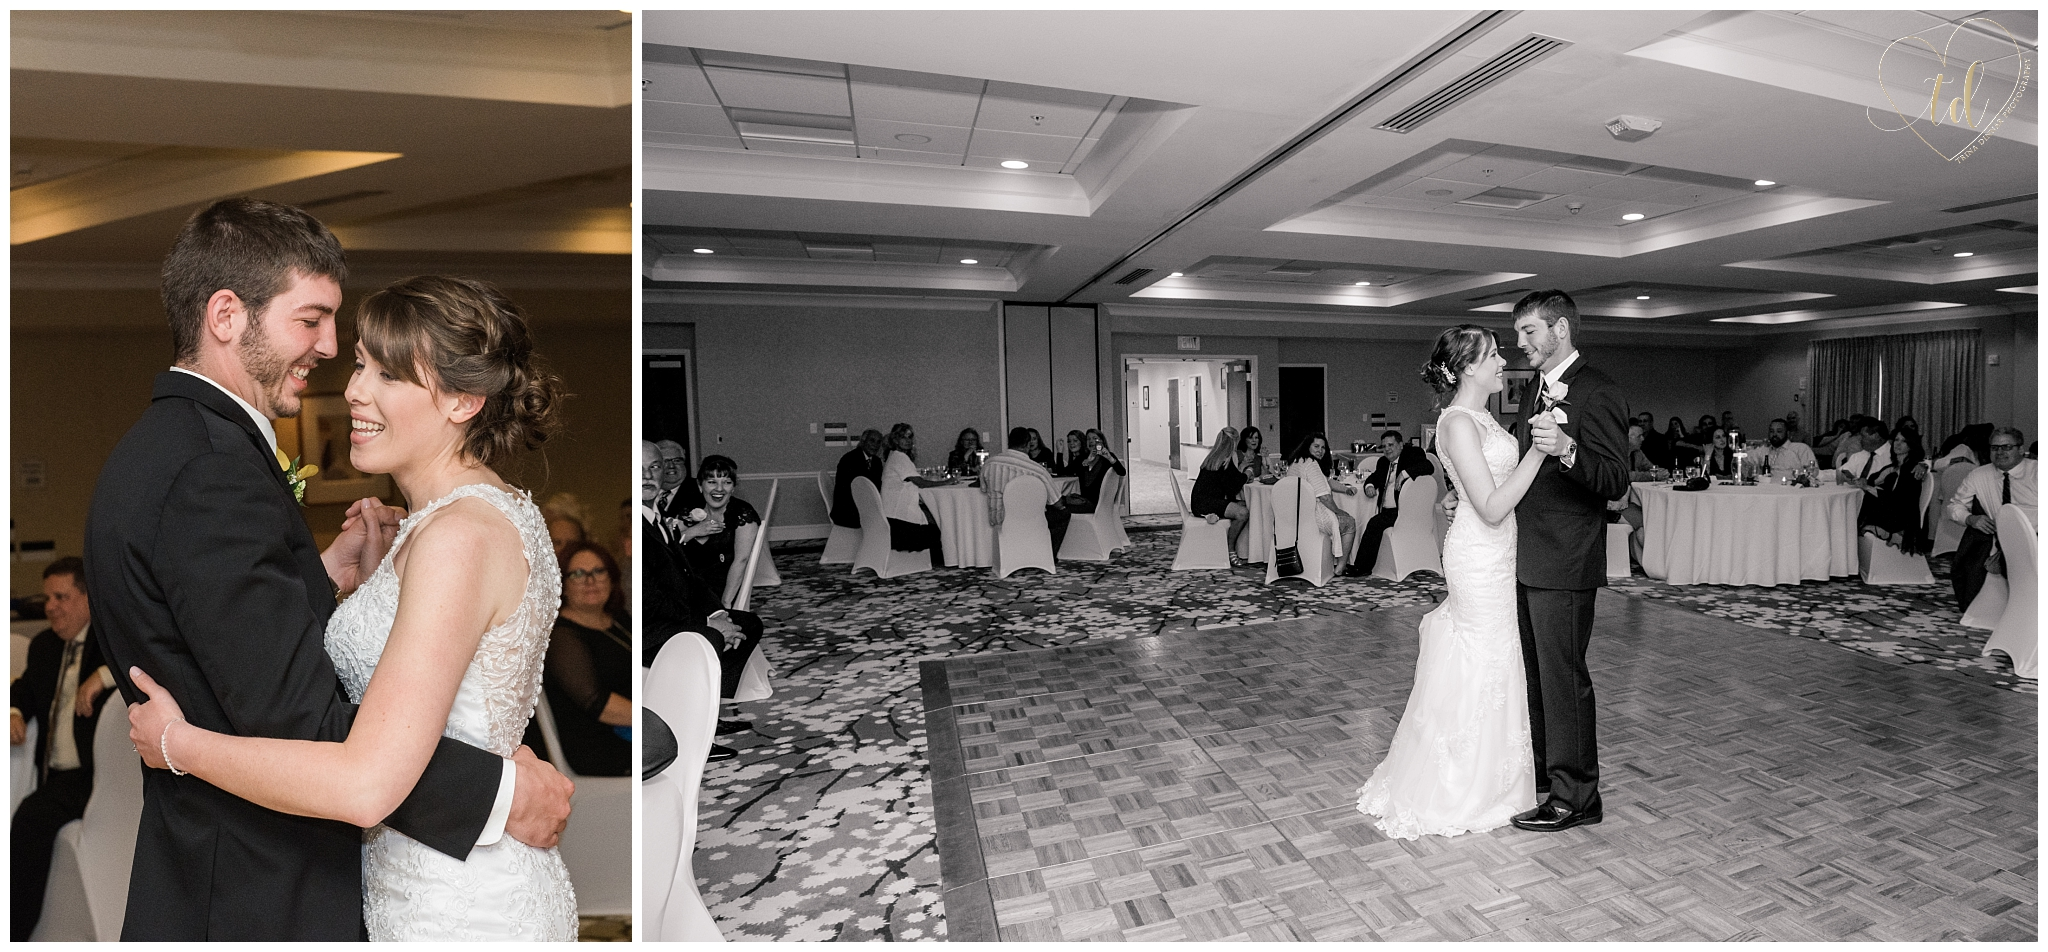 Maine Wedding at the Hilton Garden Inn in Freeport.